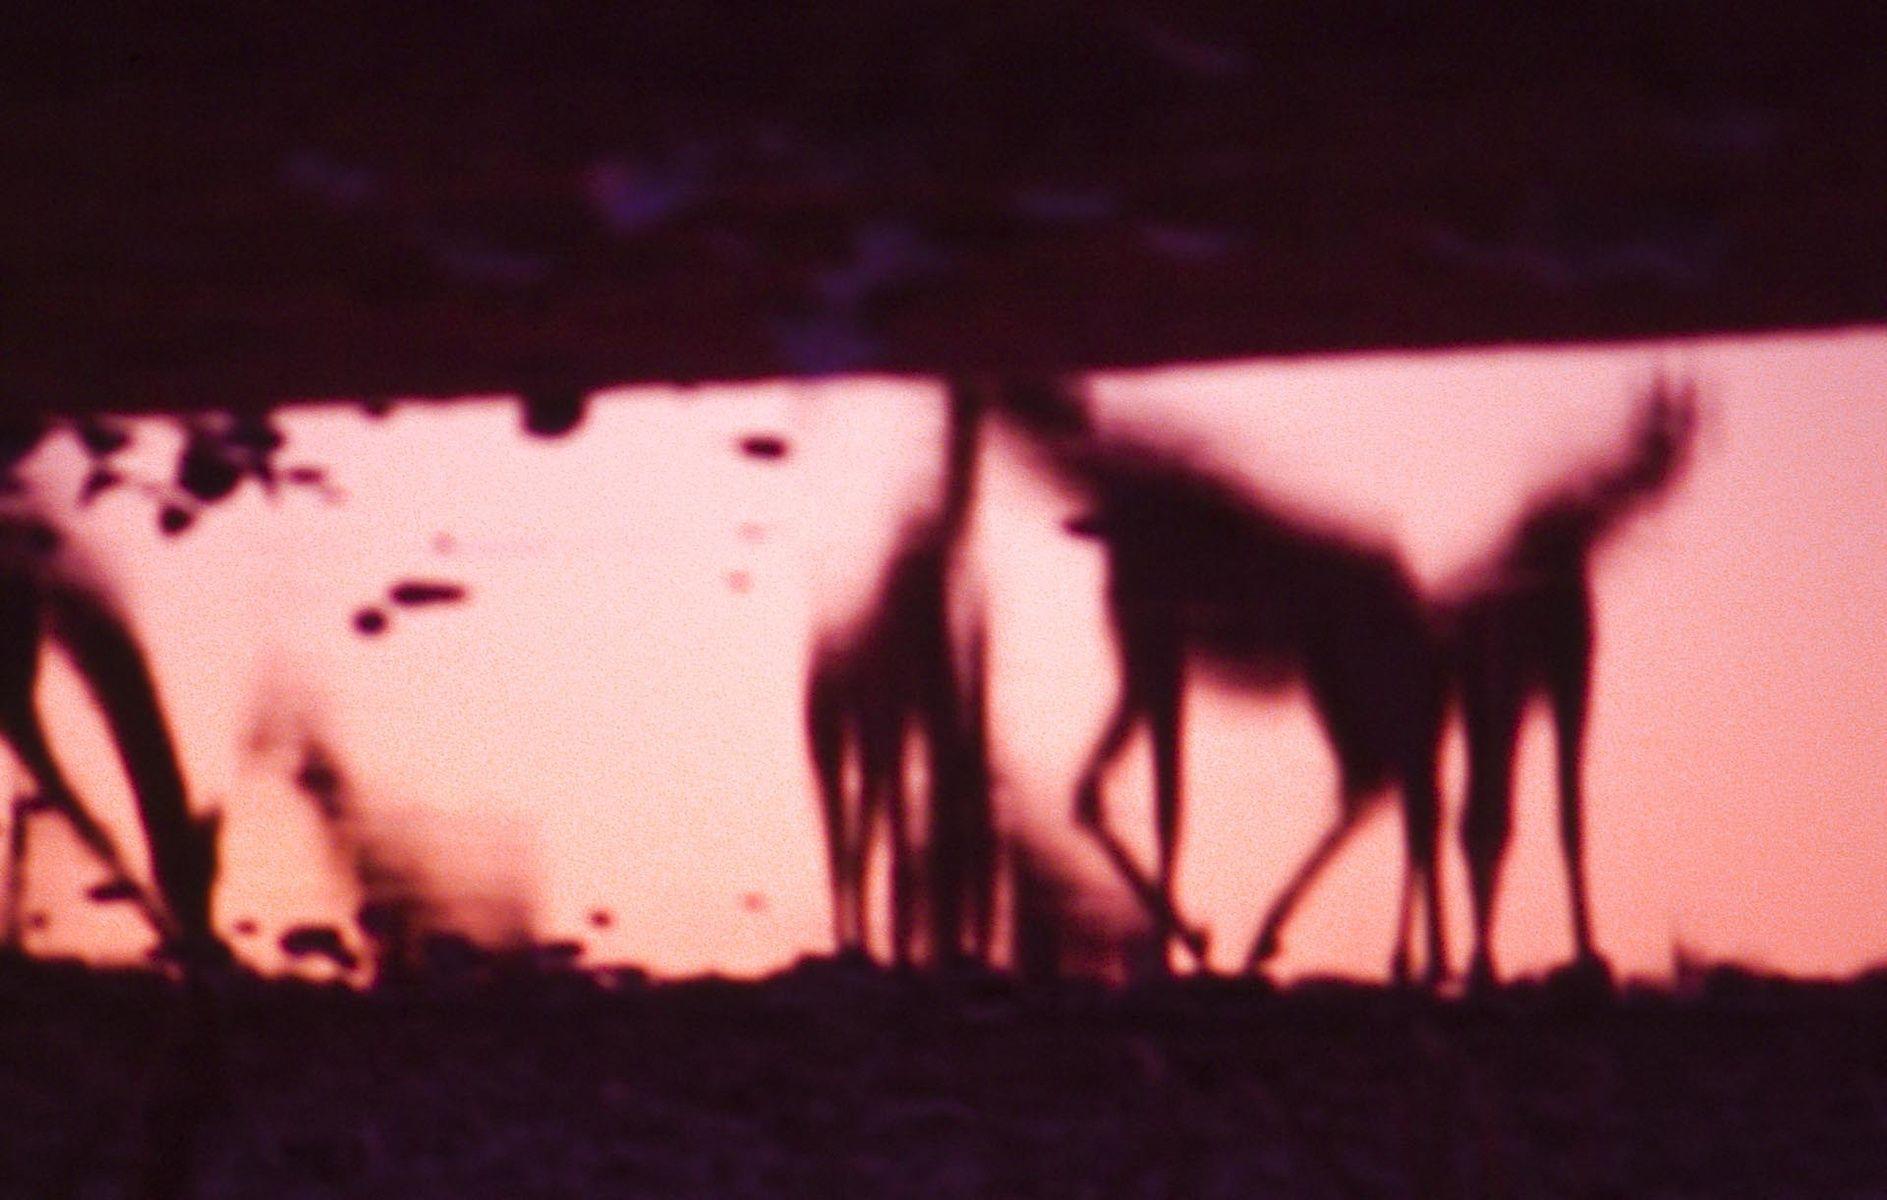 Asca S.R. Aull - Heaven On Earth/Paradis Sur Terre  (Fine Art Photography)  - _Botswana, Namibia